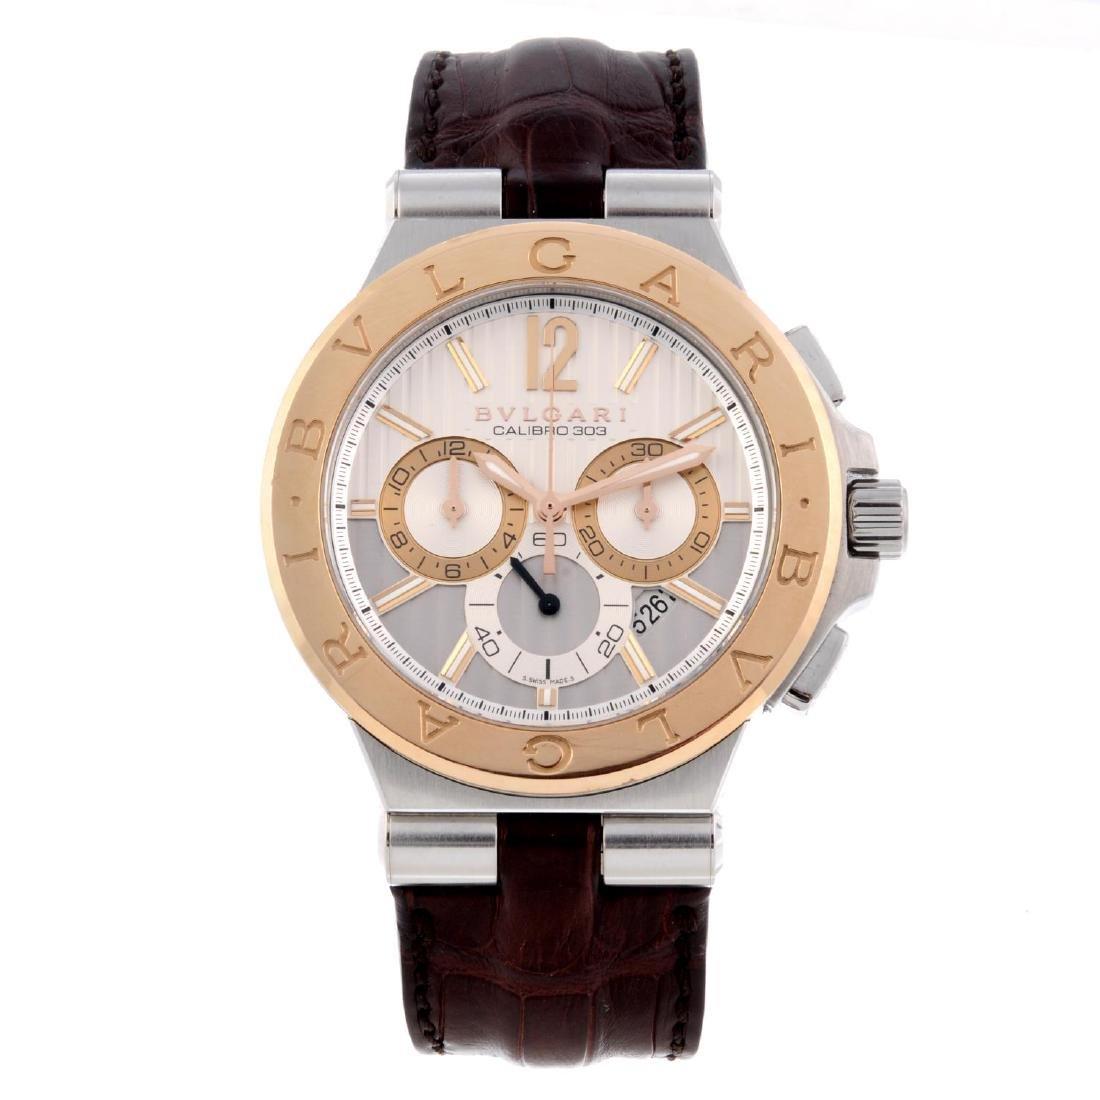 BULGARI - a gentleman's Diagono chronograph wrist